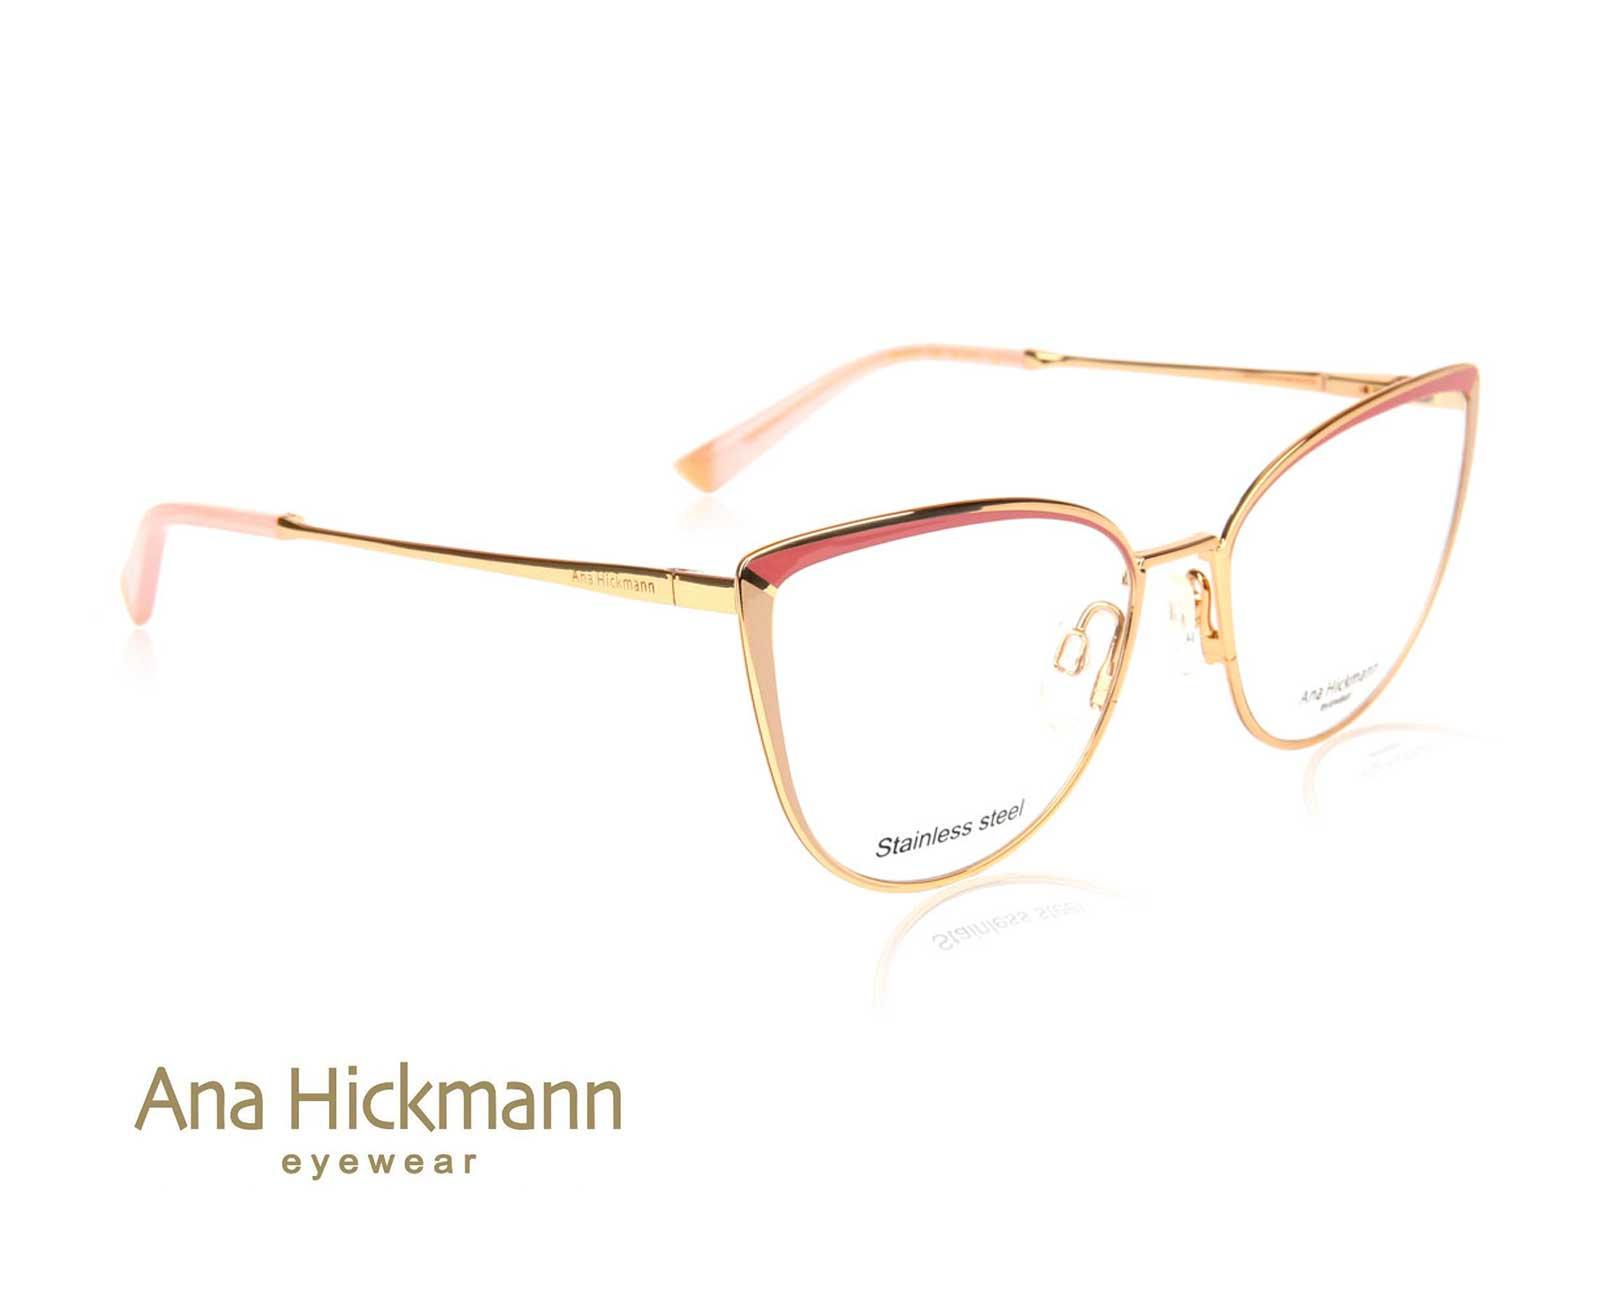 Ana Hickmann AH1374 in Gold/Taro Milk/Shiny Brown Pink